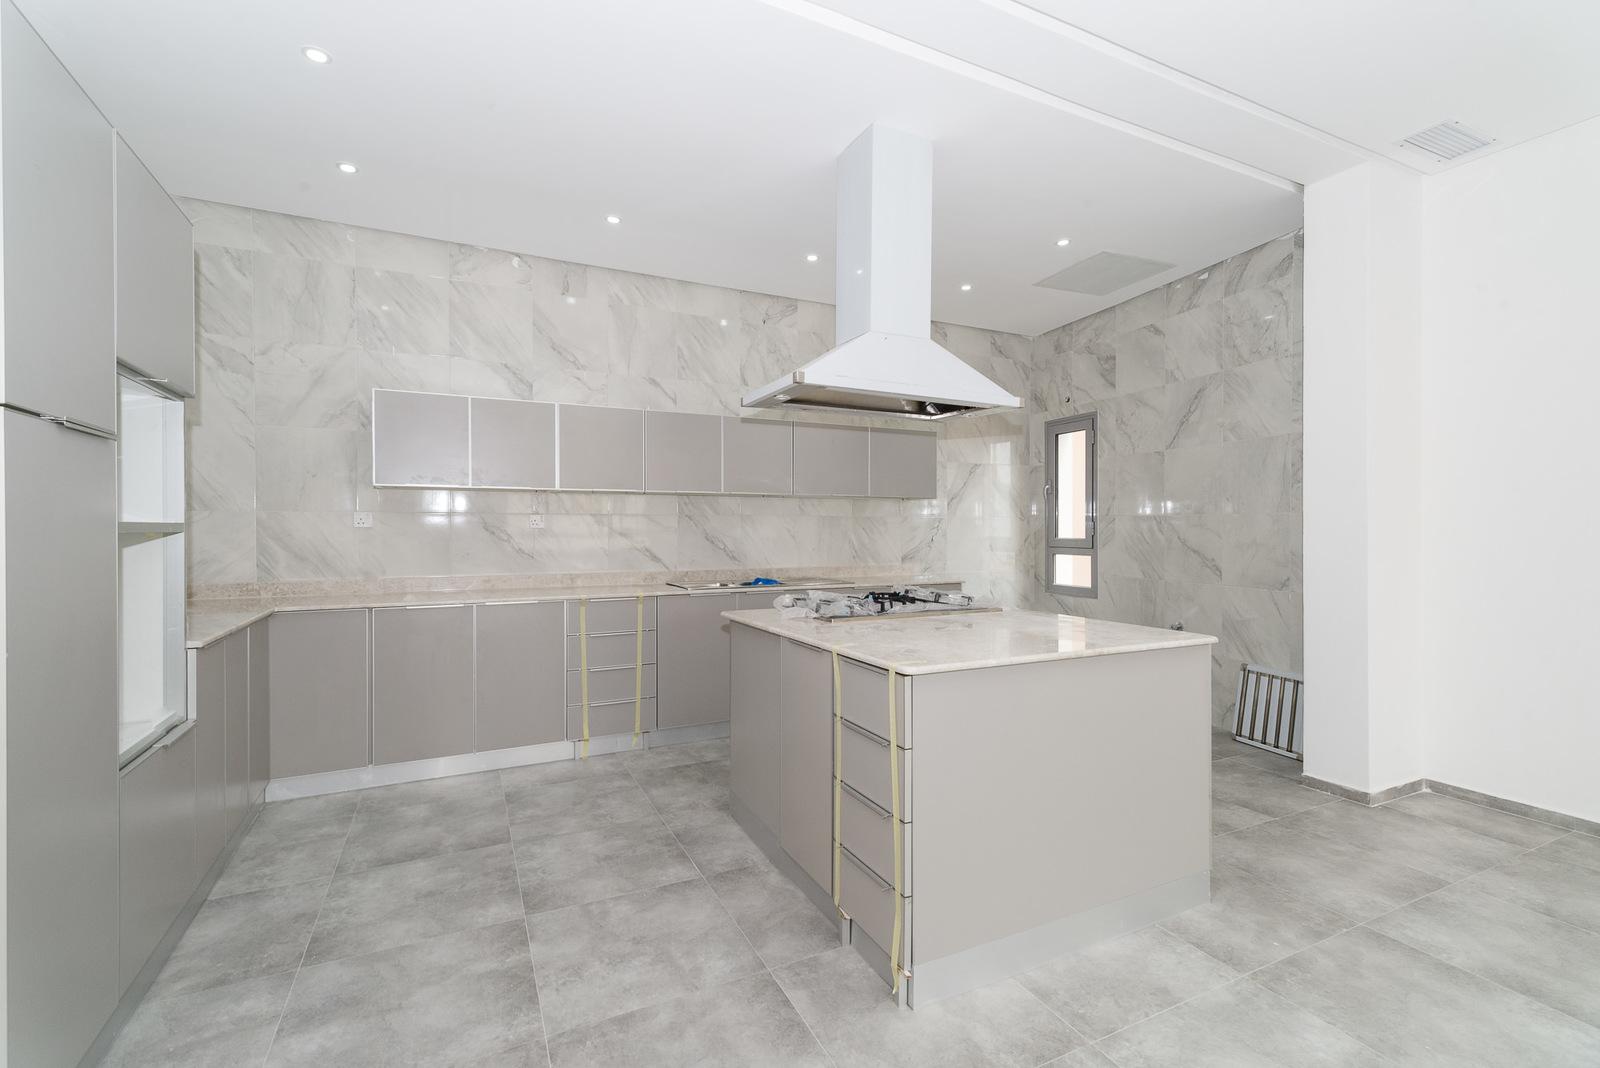 Mangaf – new, spacious, unfurnished, three bedroom floor